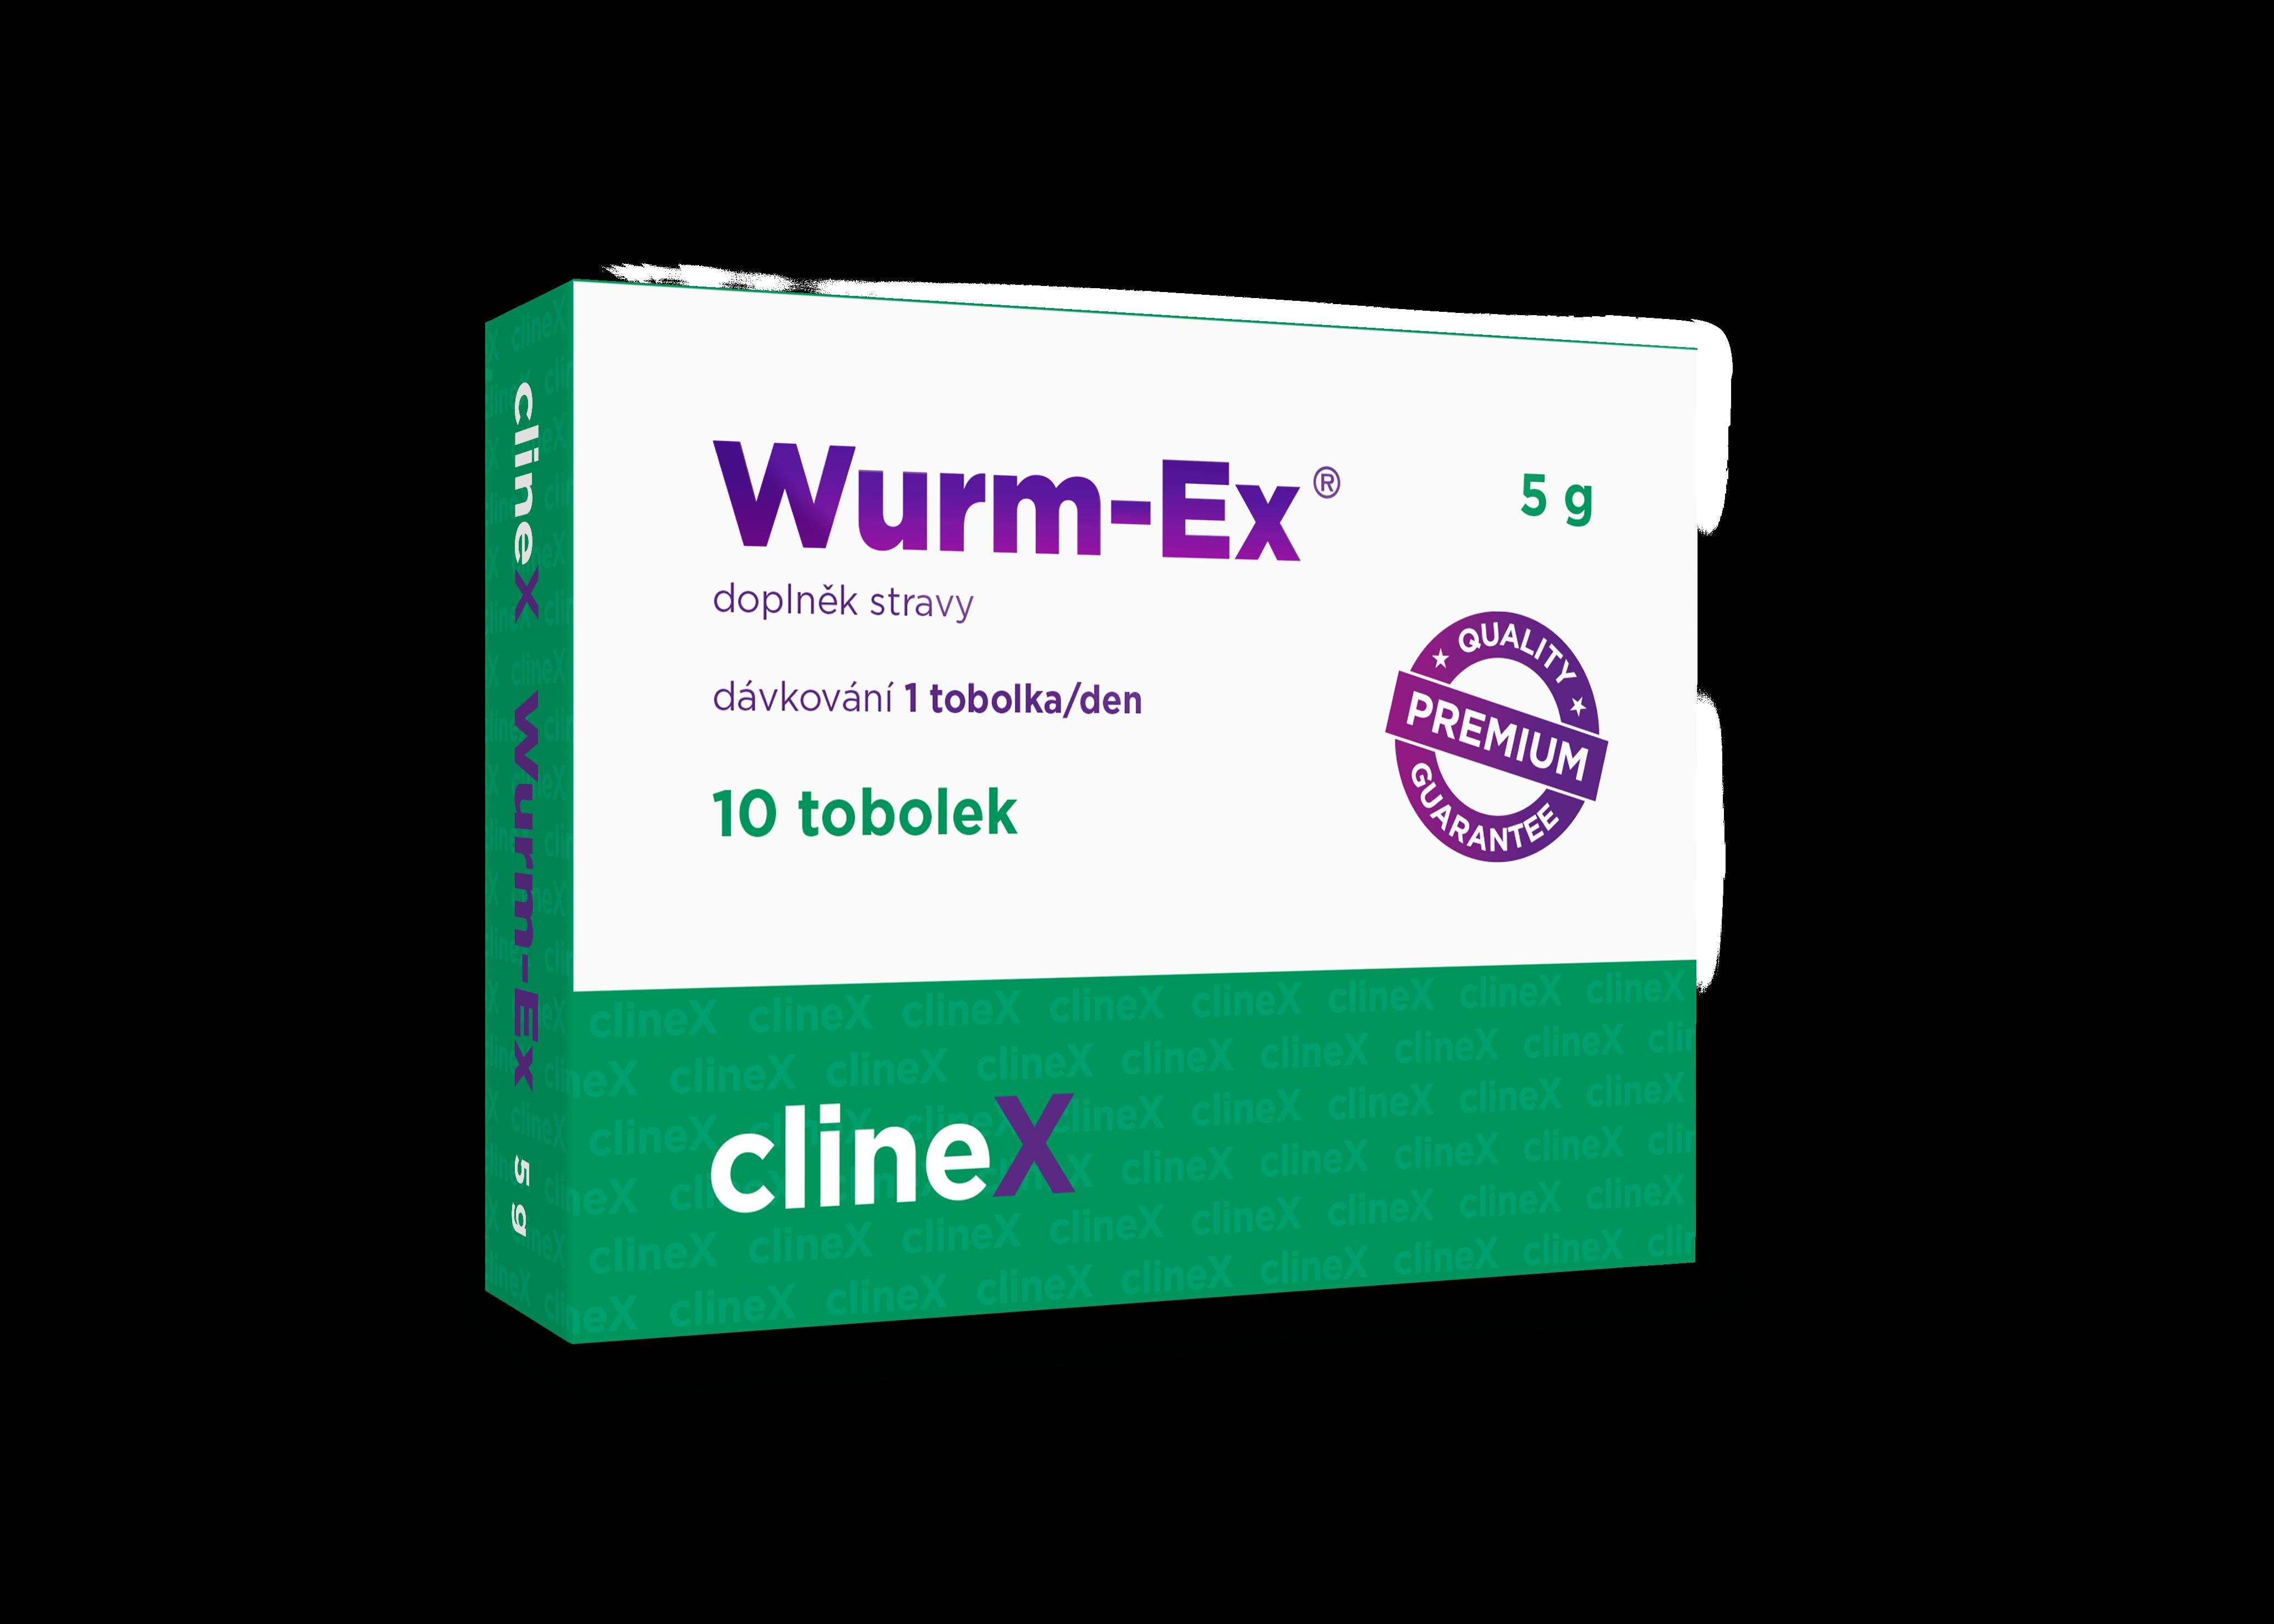 Balení Wurm-Ex